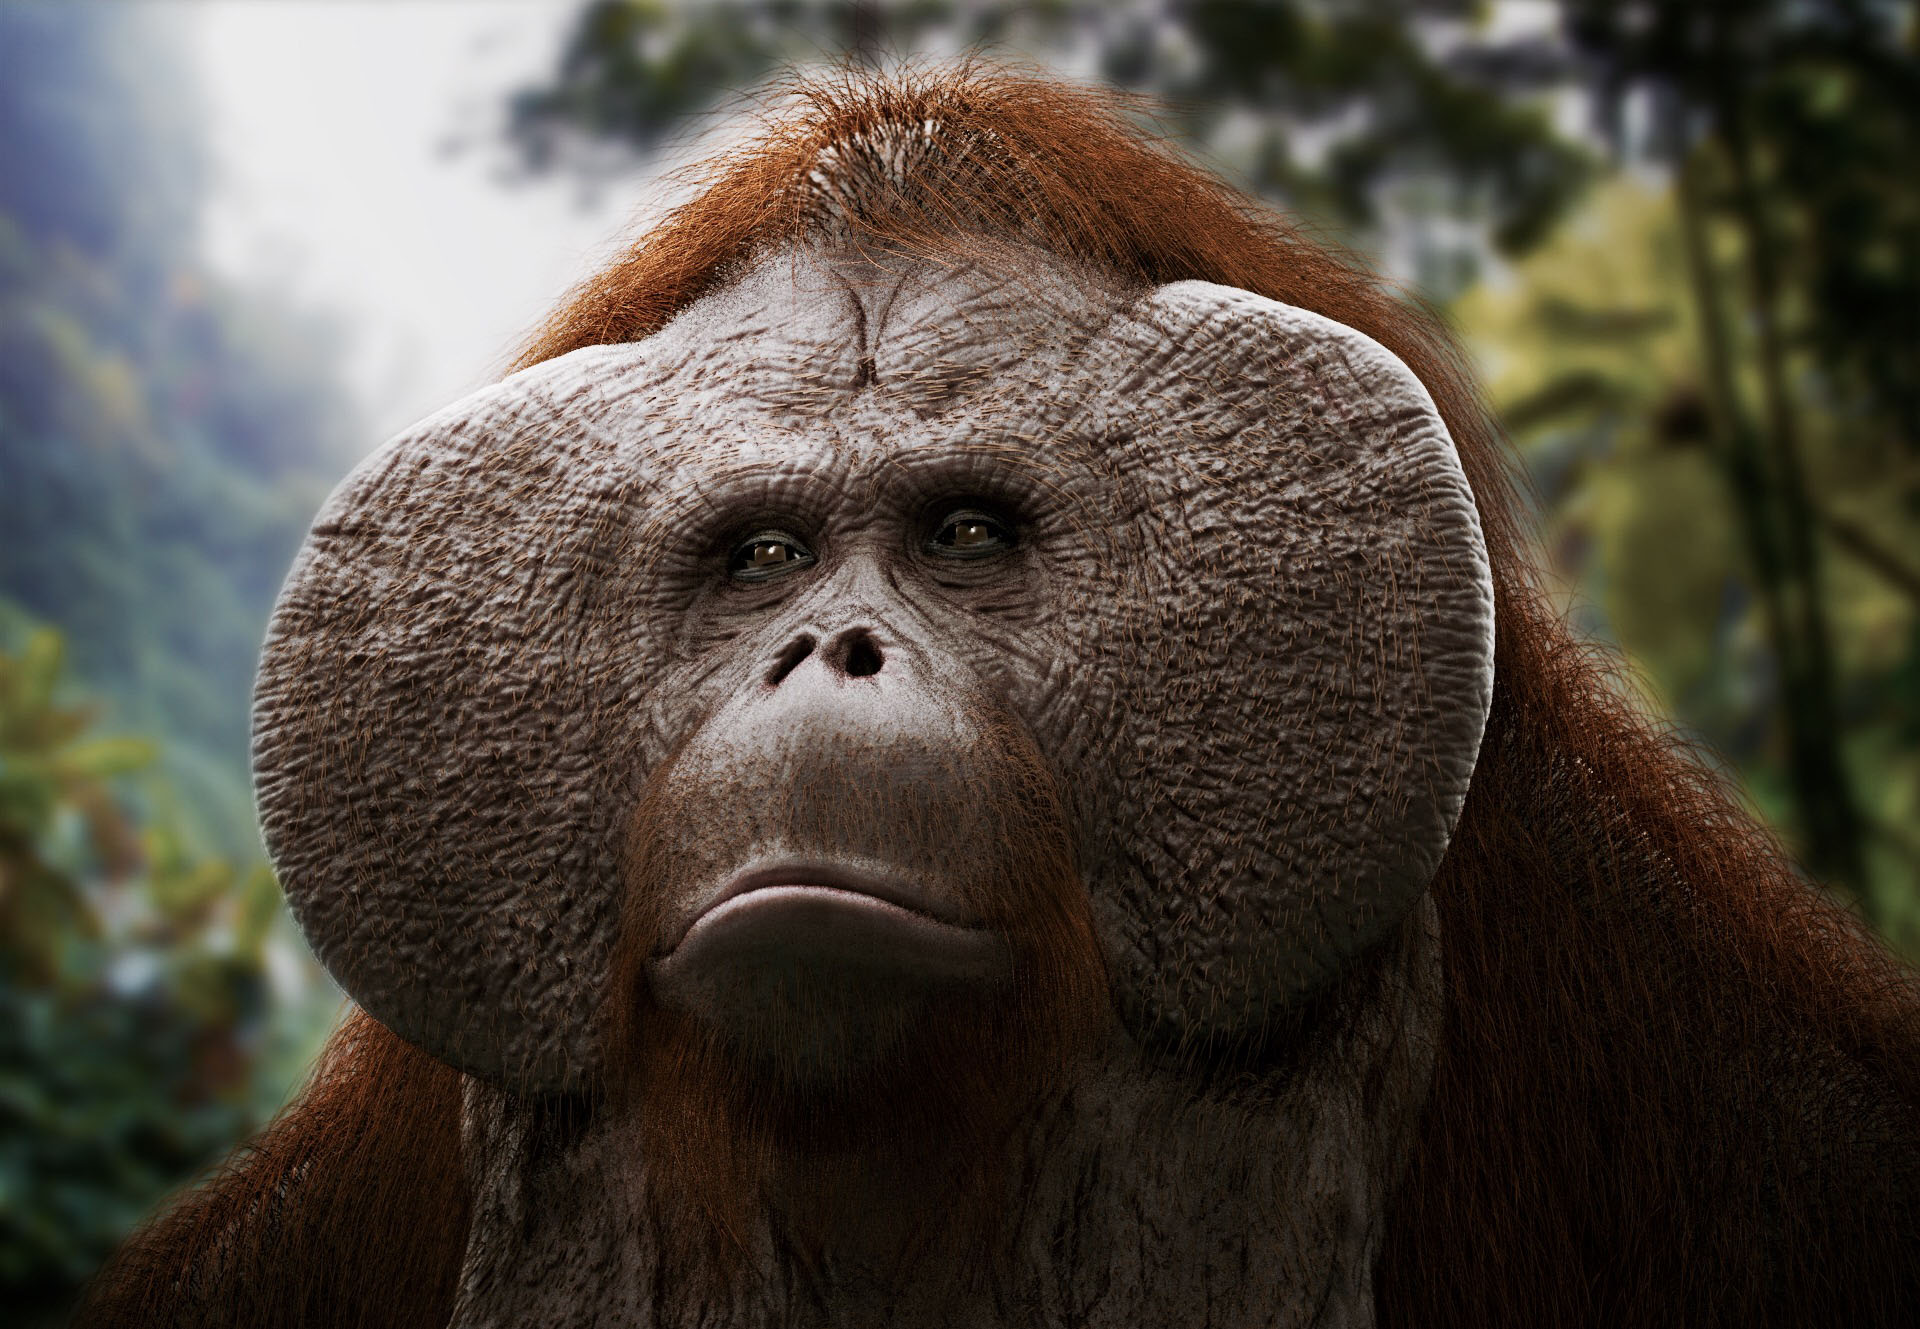 Orangutan (2 days project)